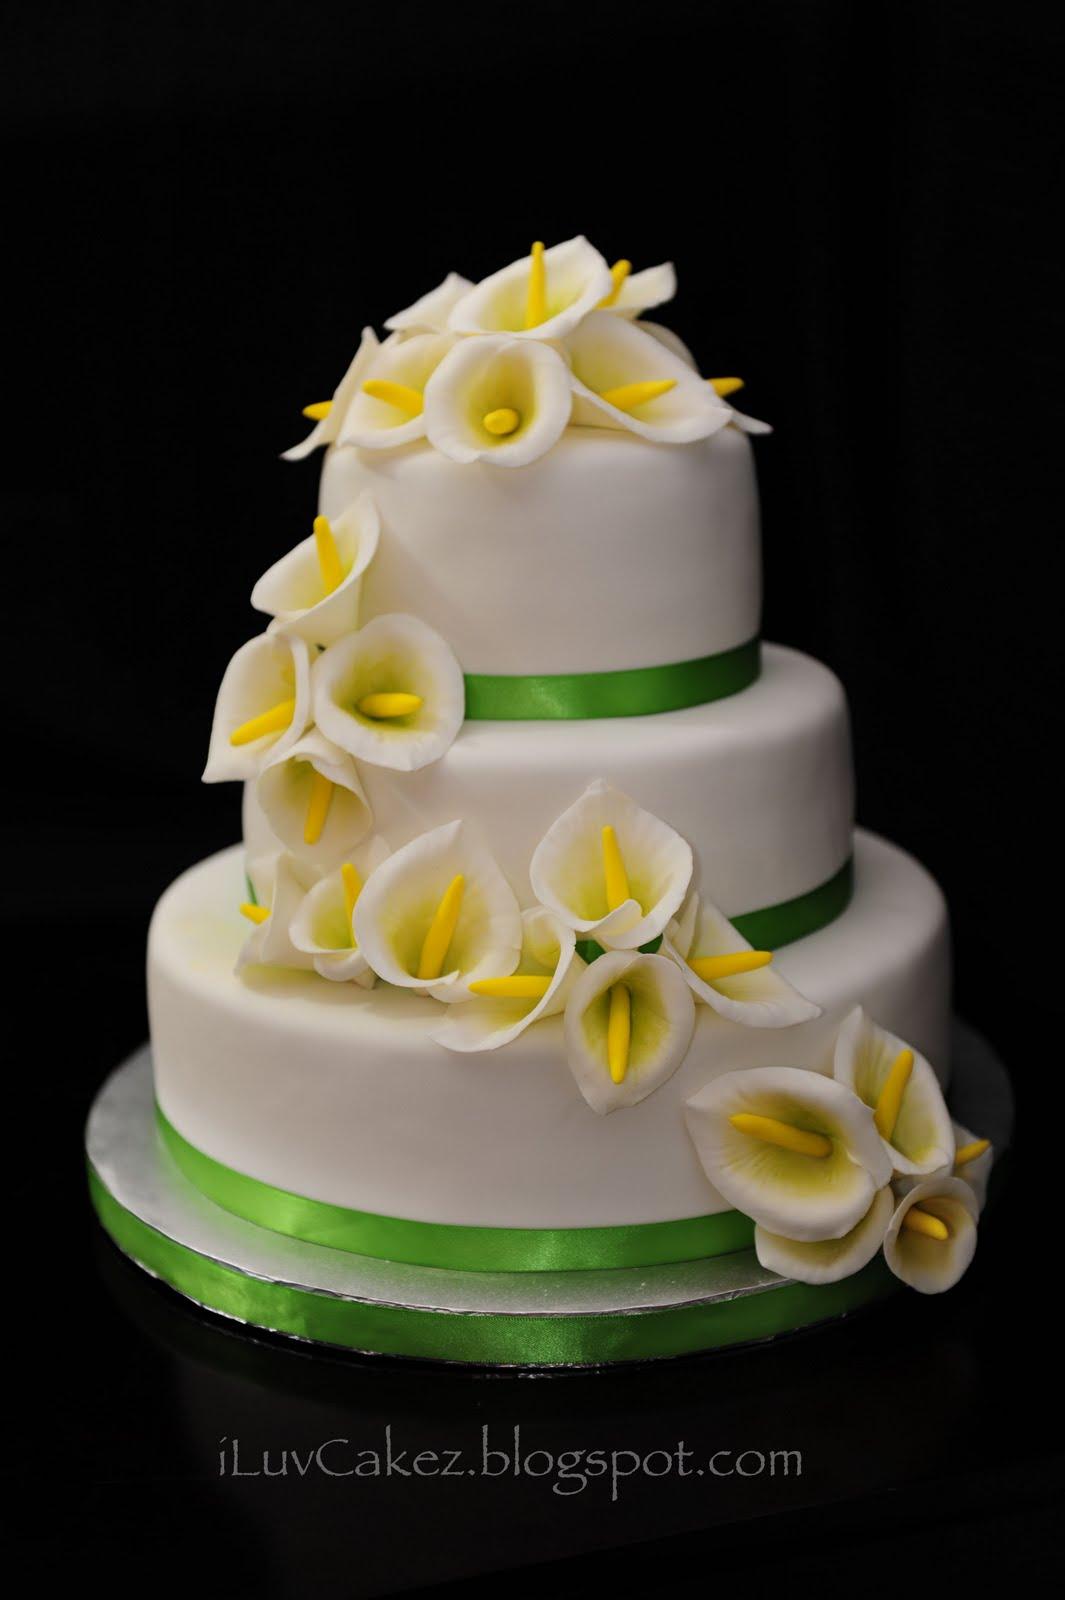 iLuv Cakez Calla Lily Wedding Cake Daniel & Susan